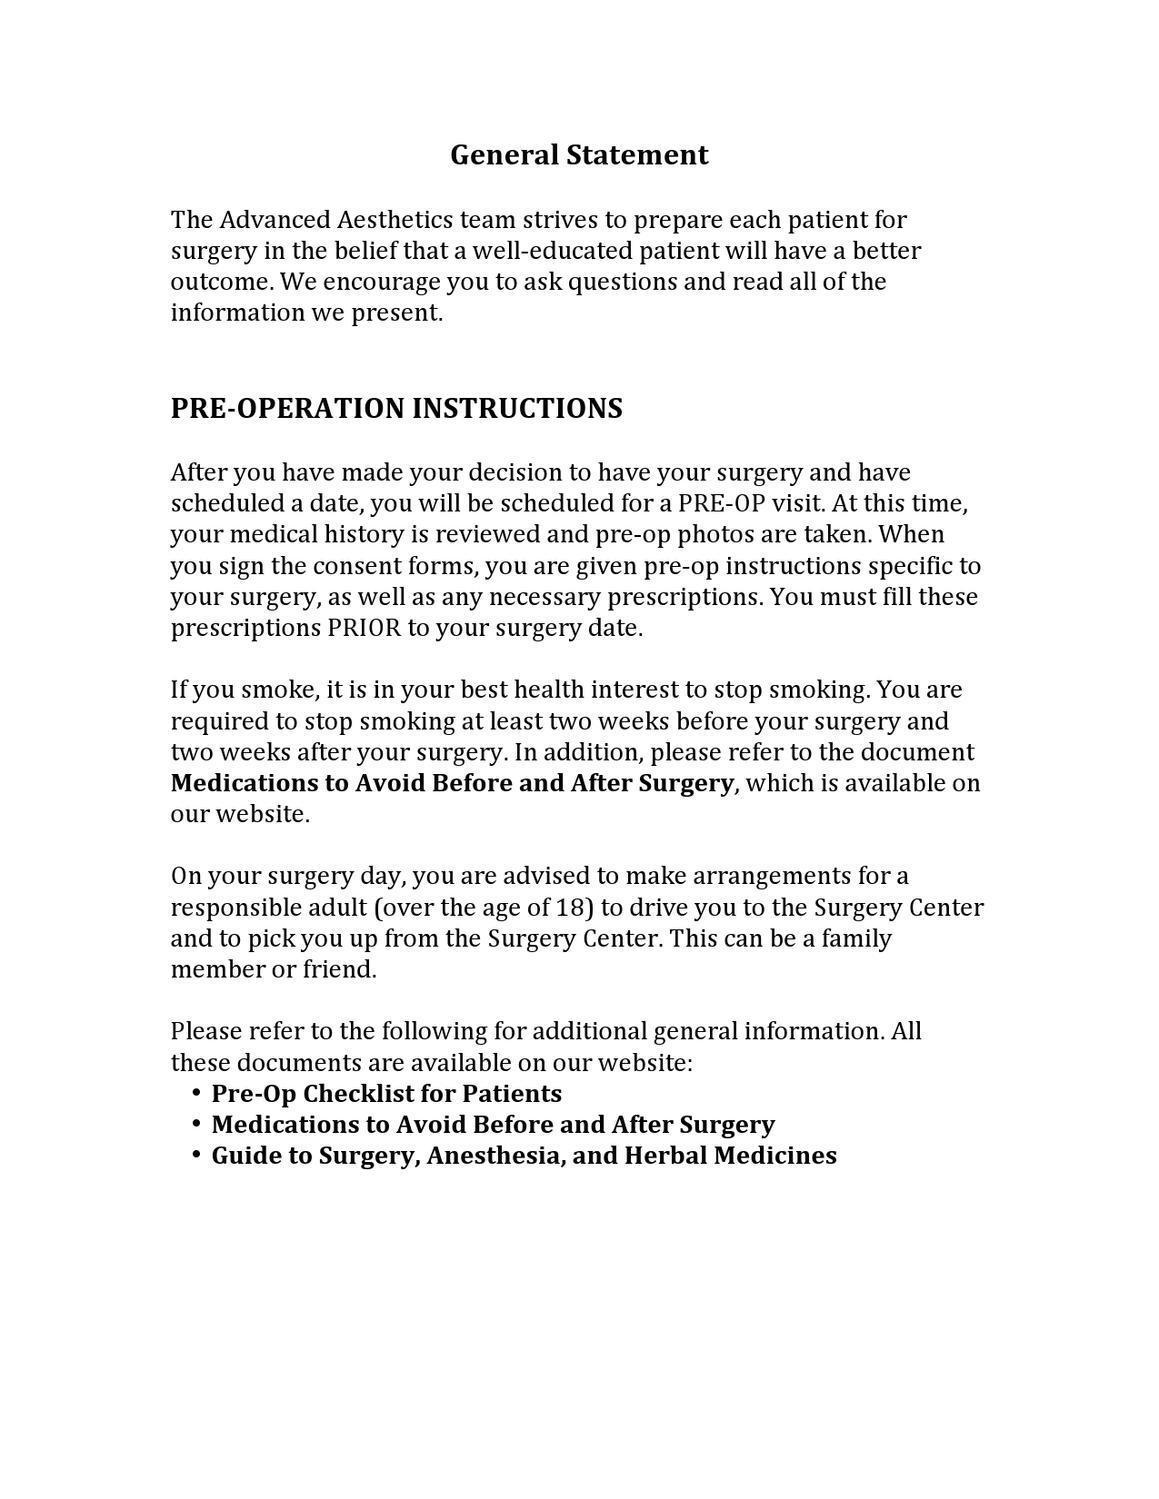 Operation Instruction by Advanced Aesthetics - issuu